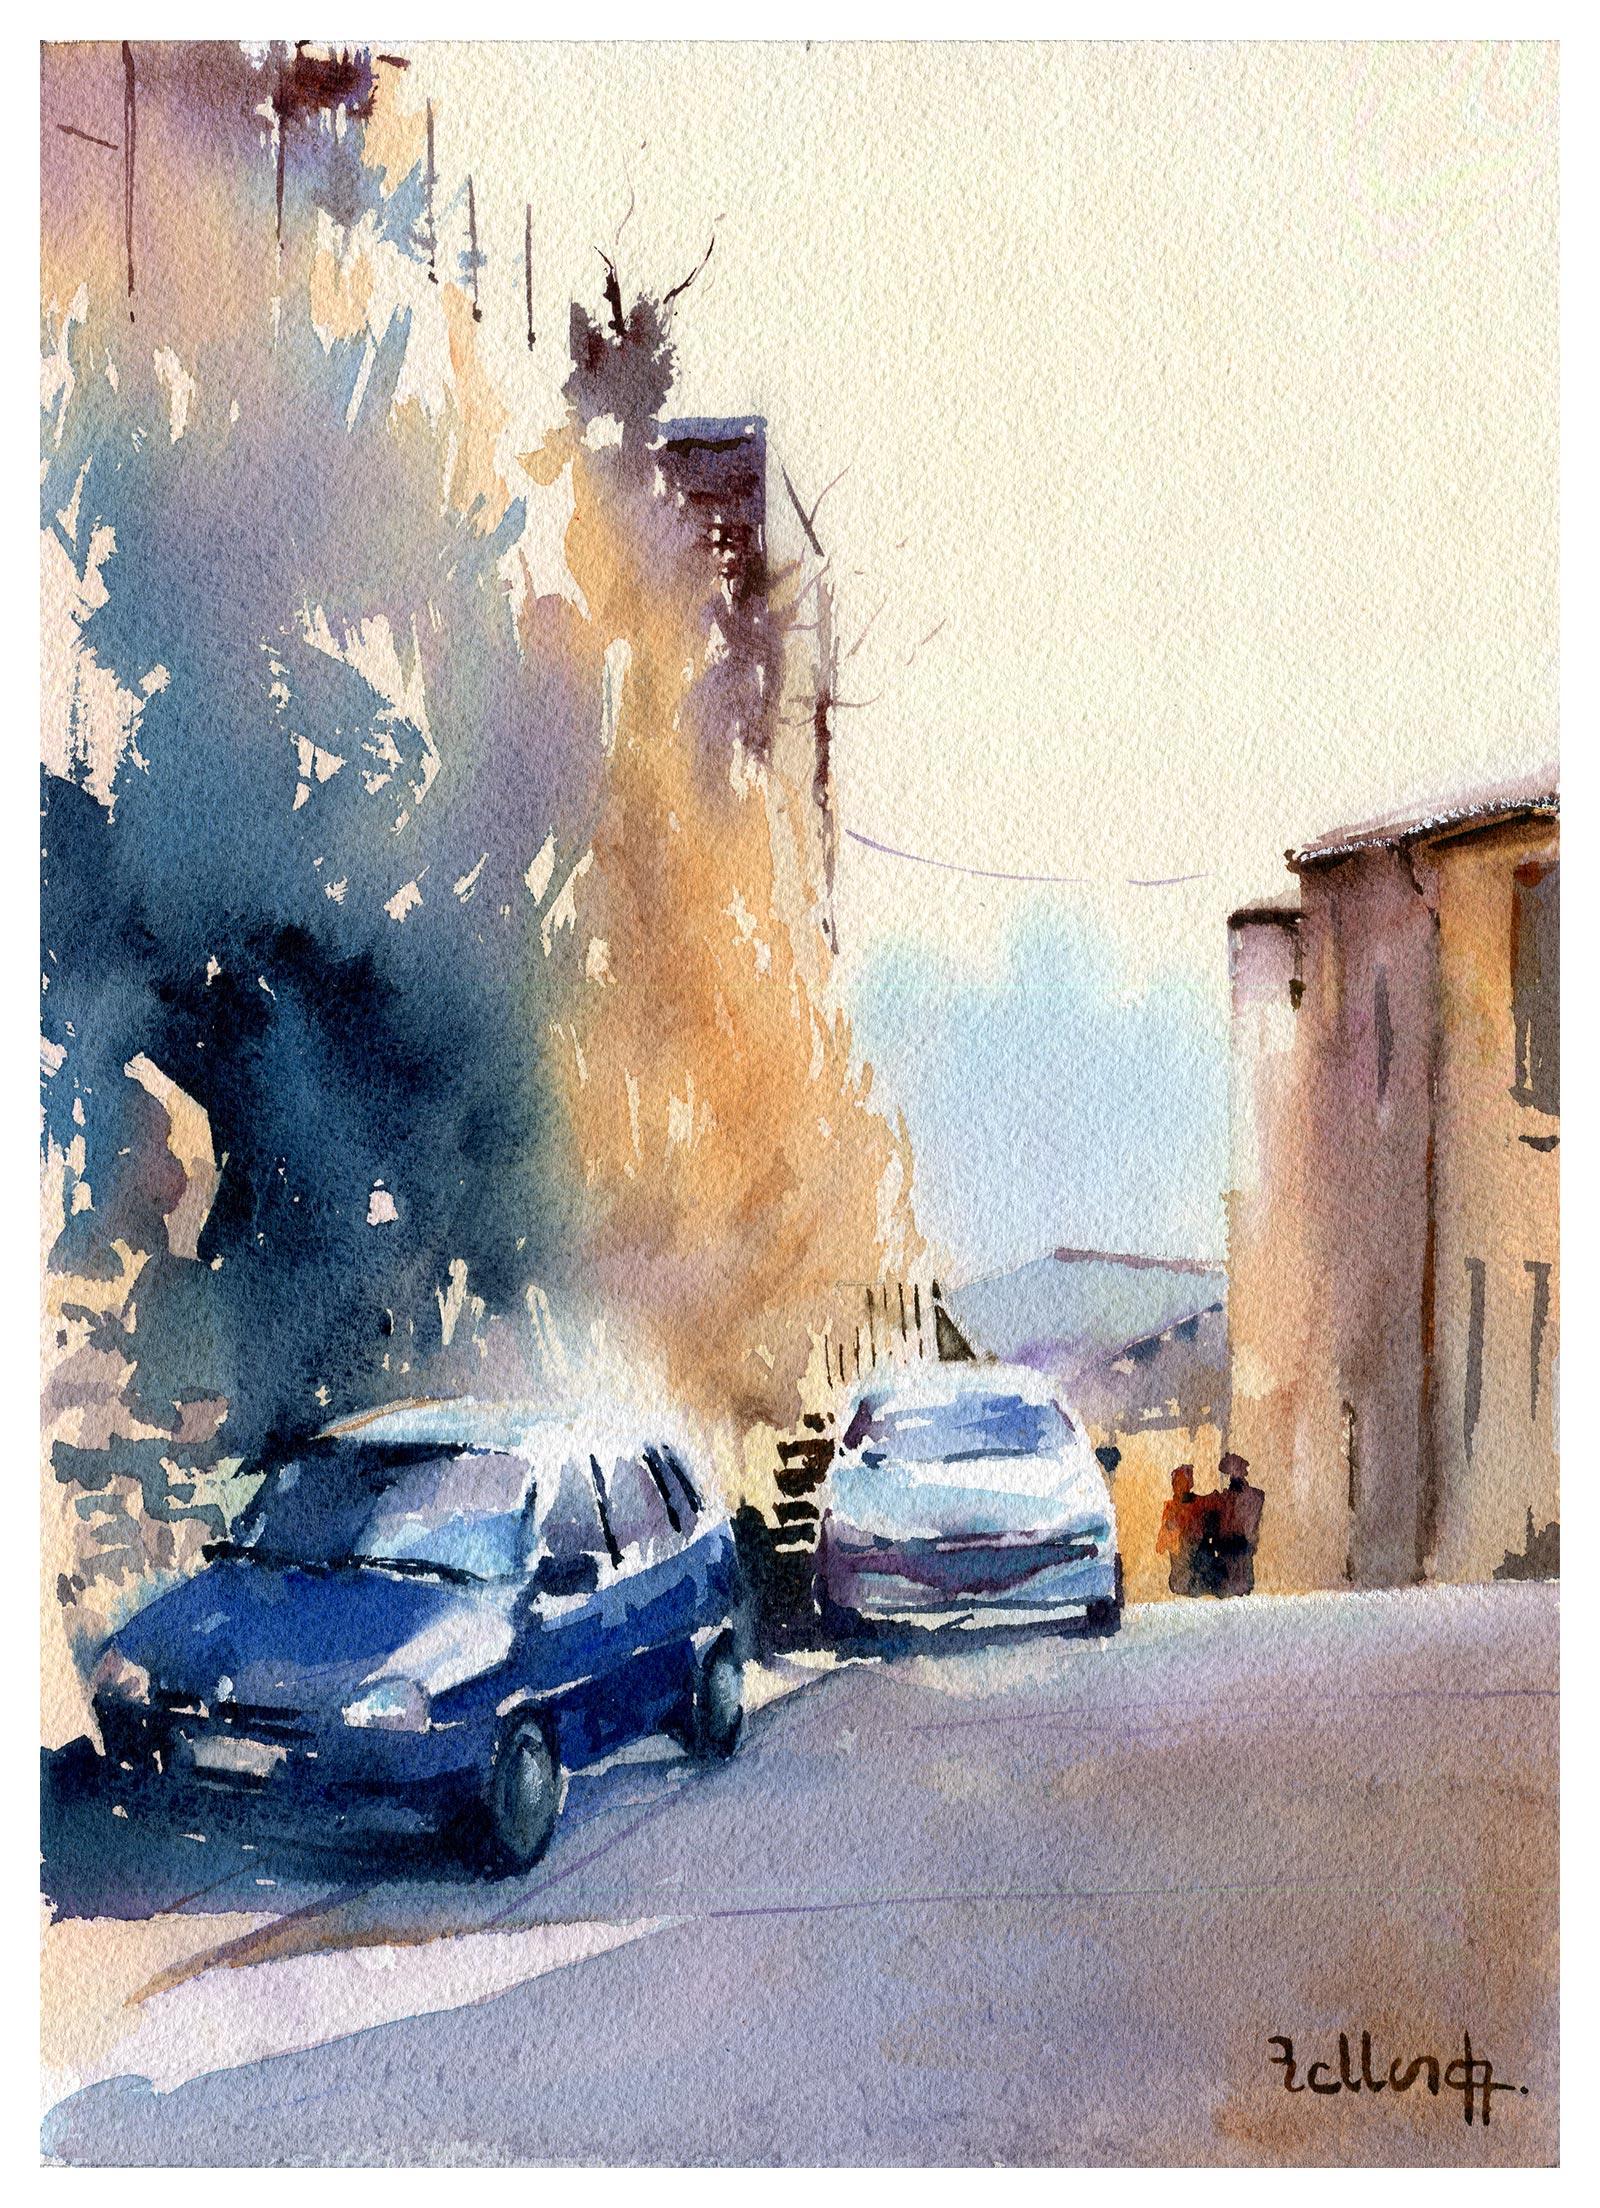 Lagnes rue des remparts